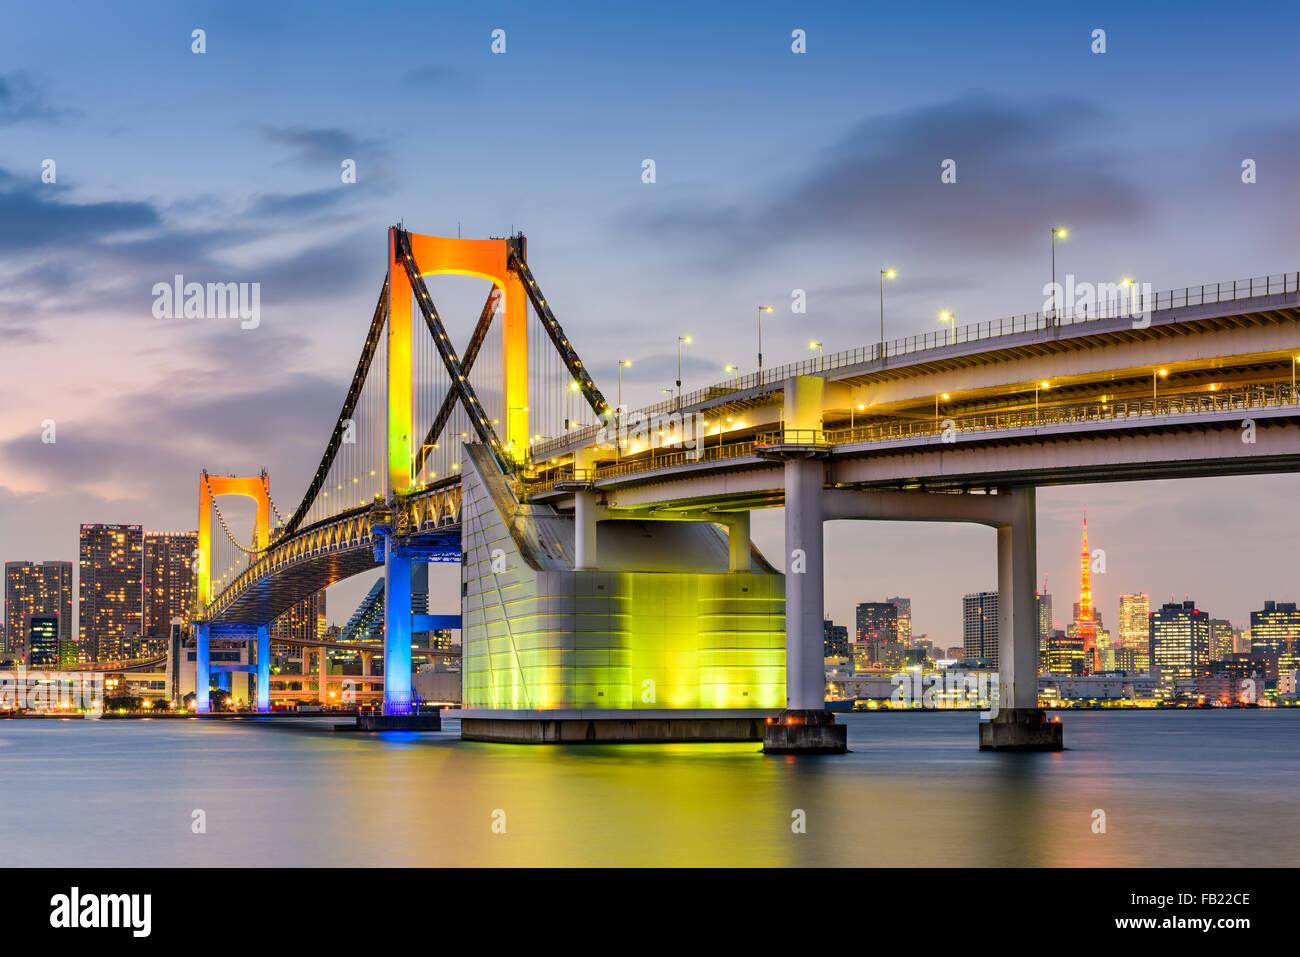 Tokyo, Japan at Rainbow Bridge spanning Tokyo Bay. - Stock Image